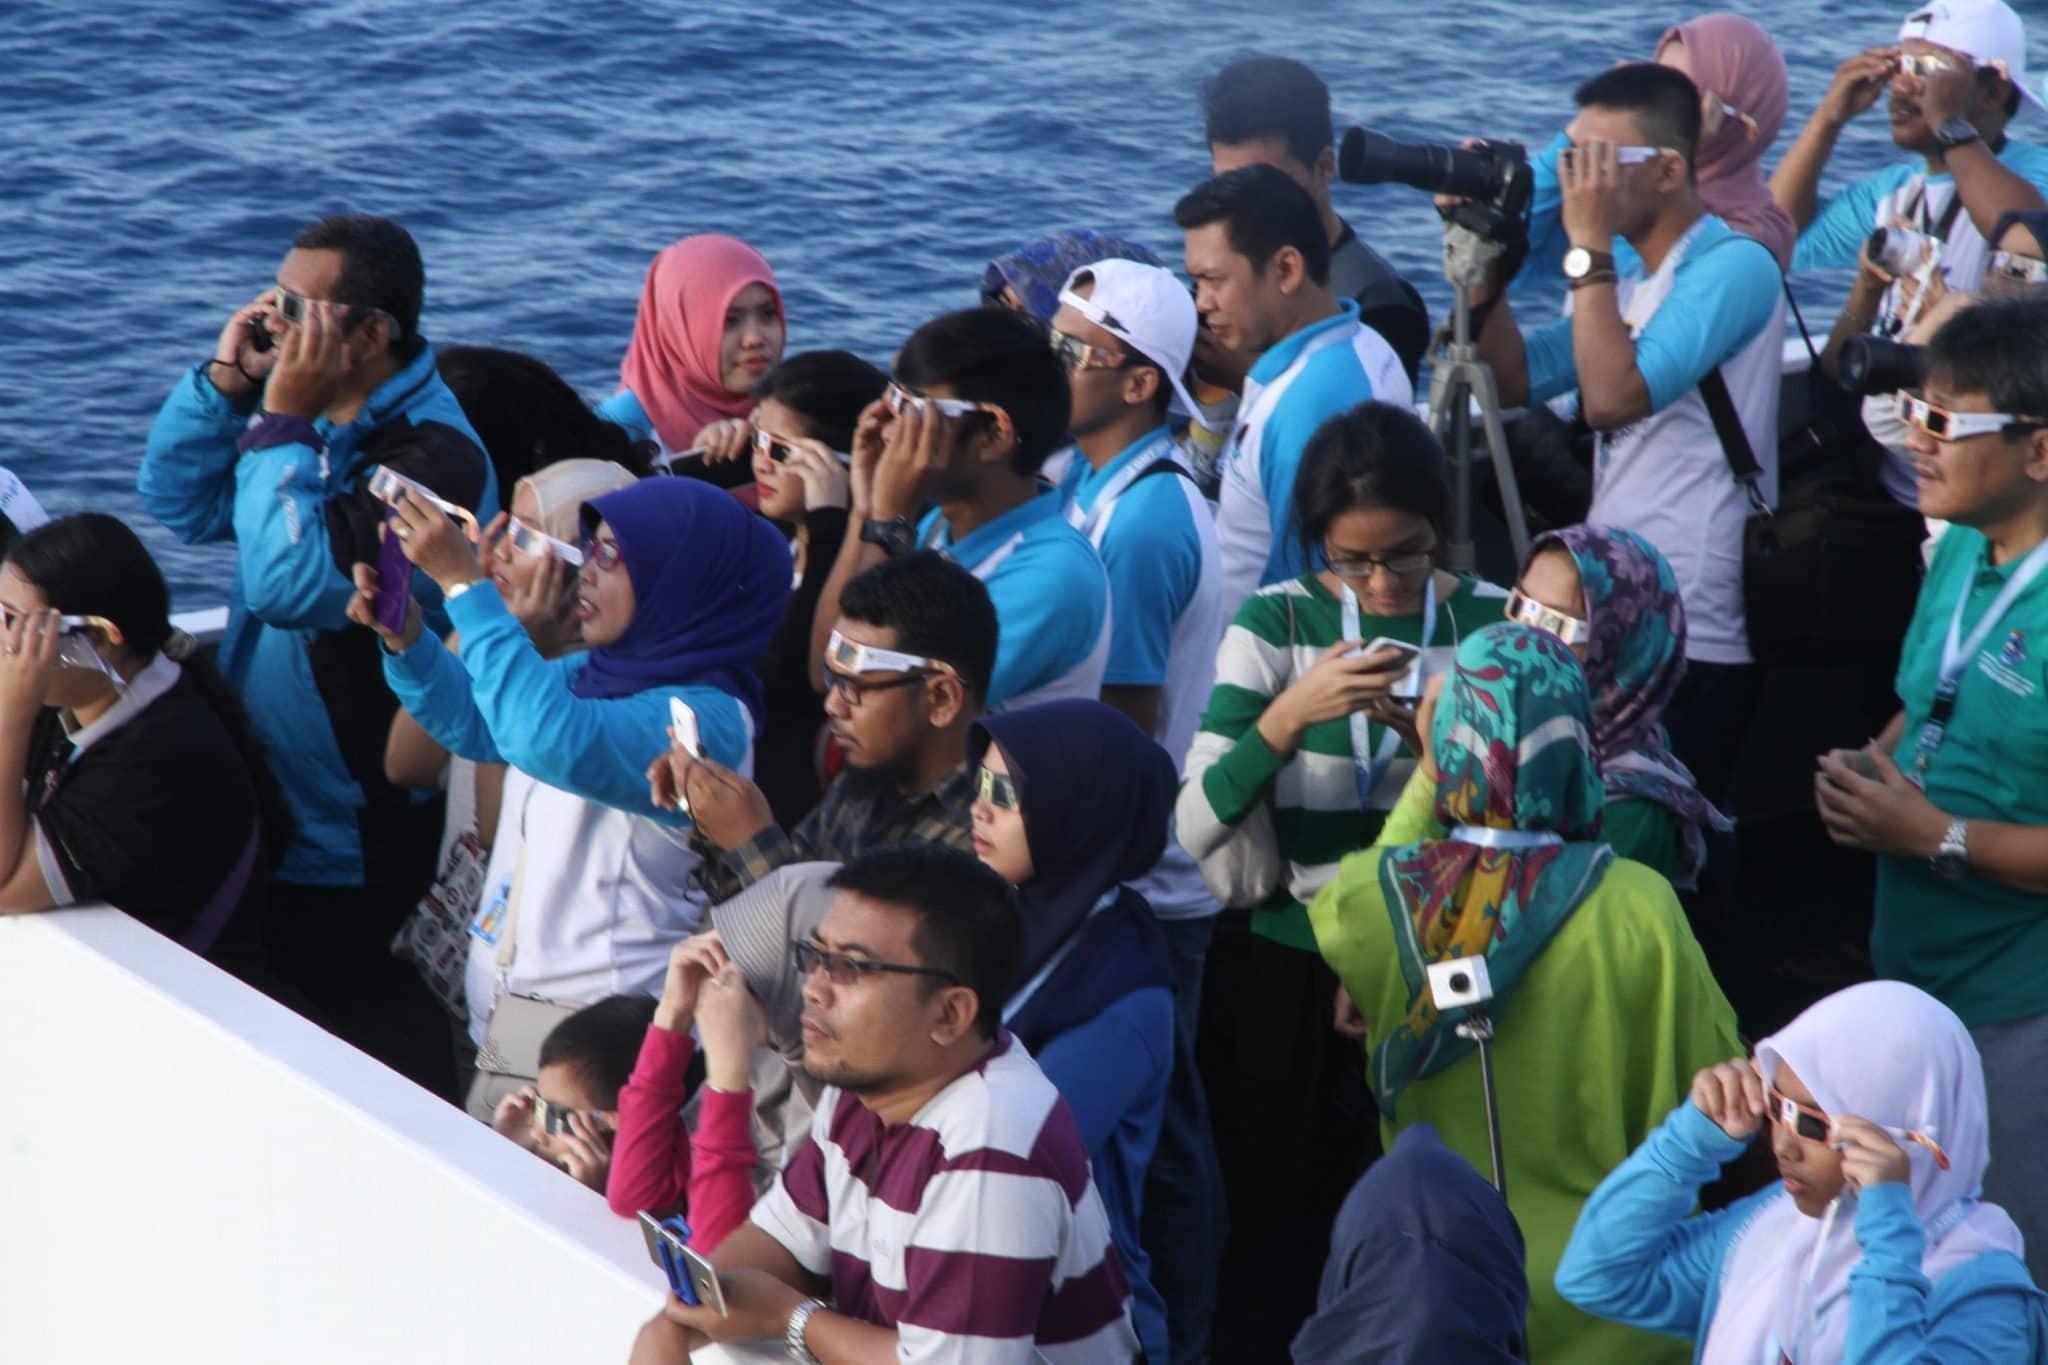 Ekspedisi Maritim Gelar Sholat Gerhana di Atas Kapal